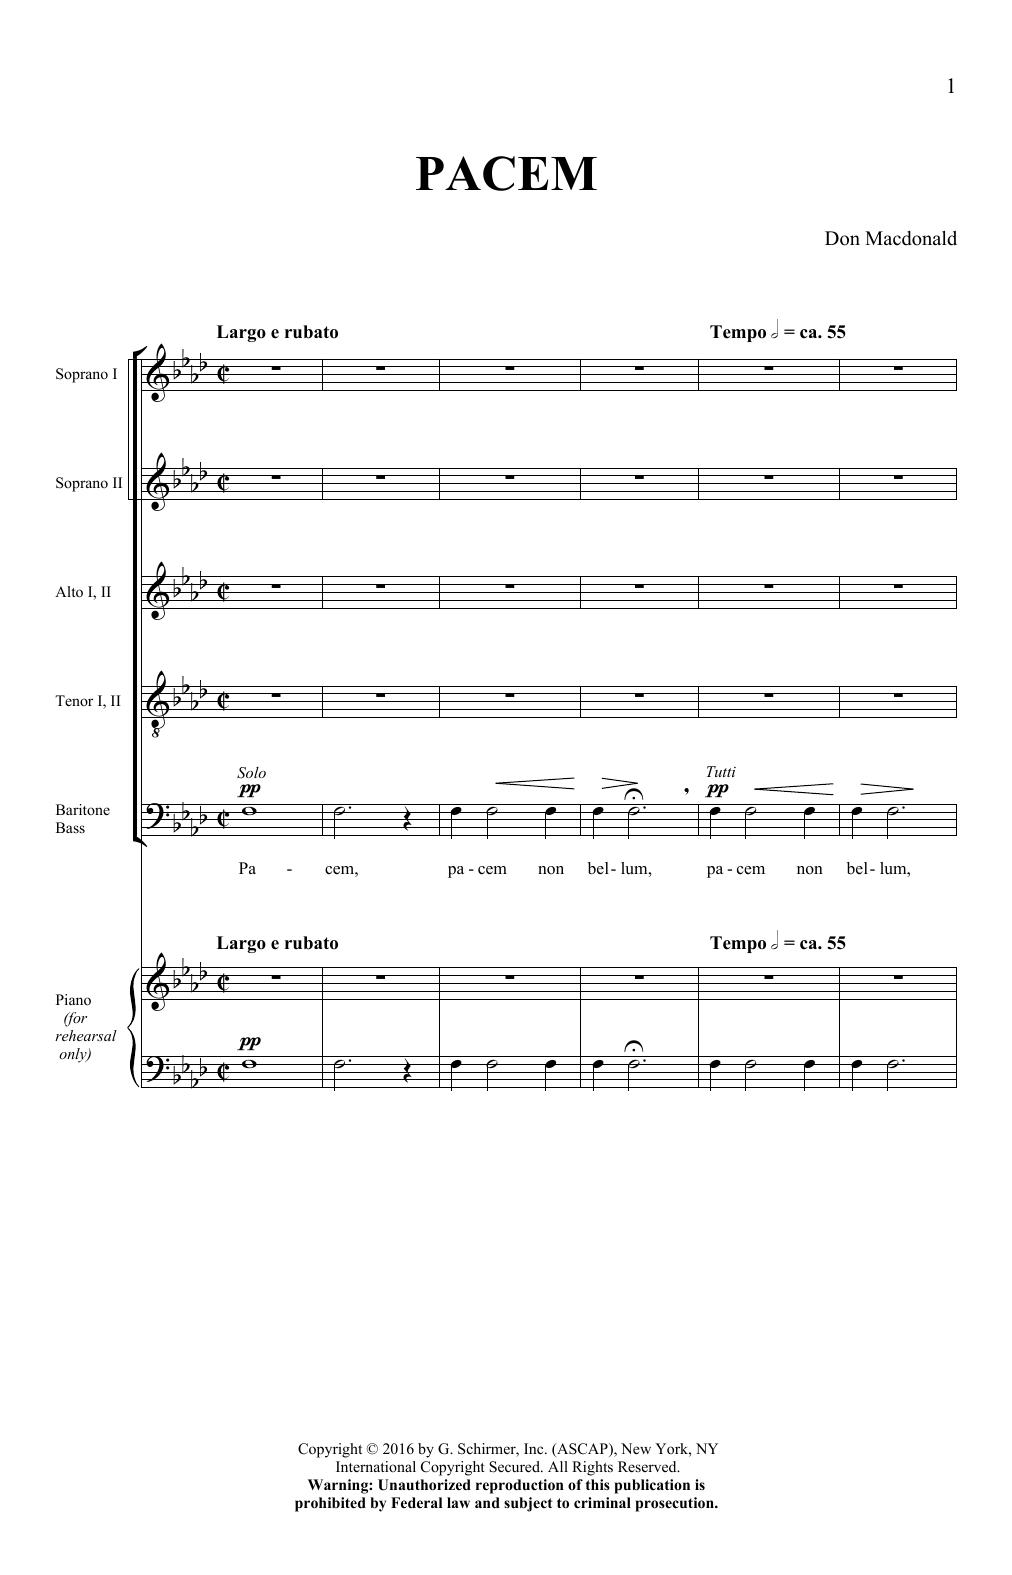 Don Macdonald Pacem sheet music notes and chords. Download Printable PDF.